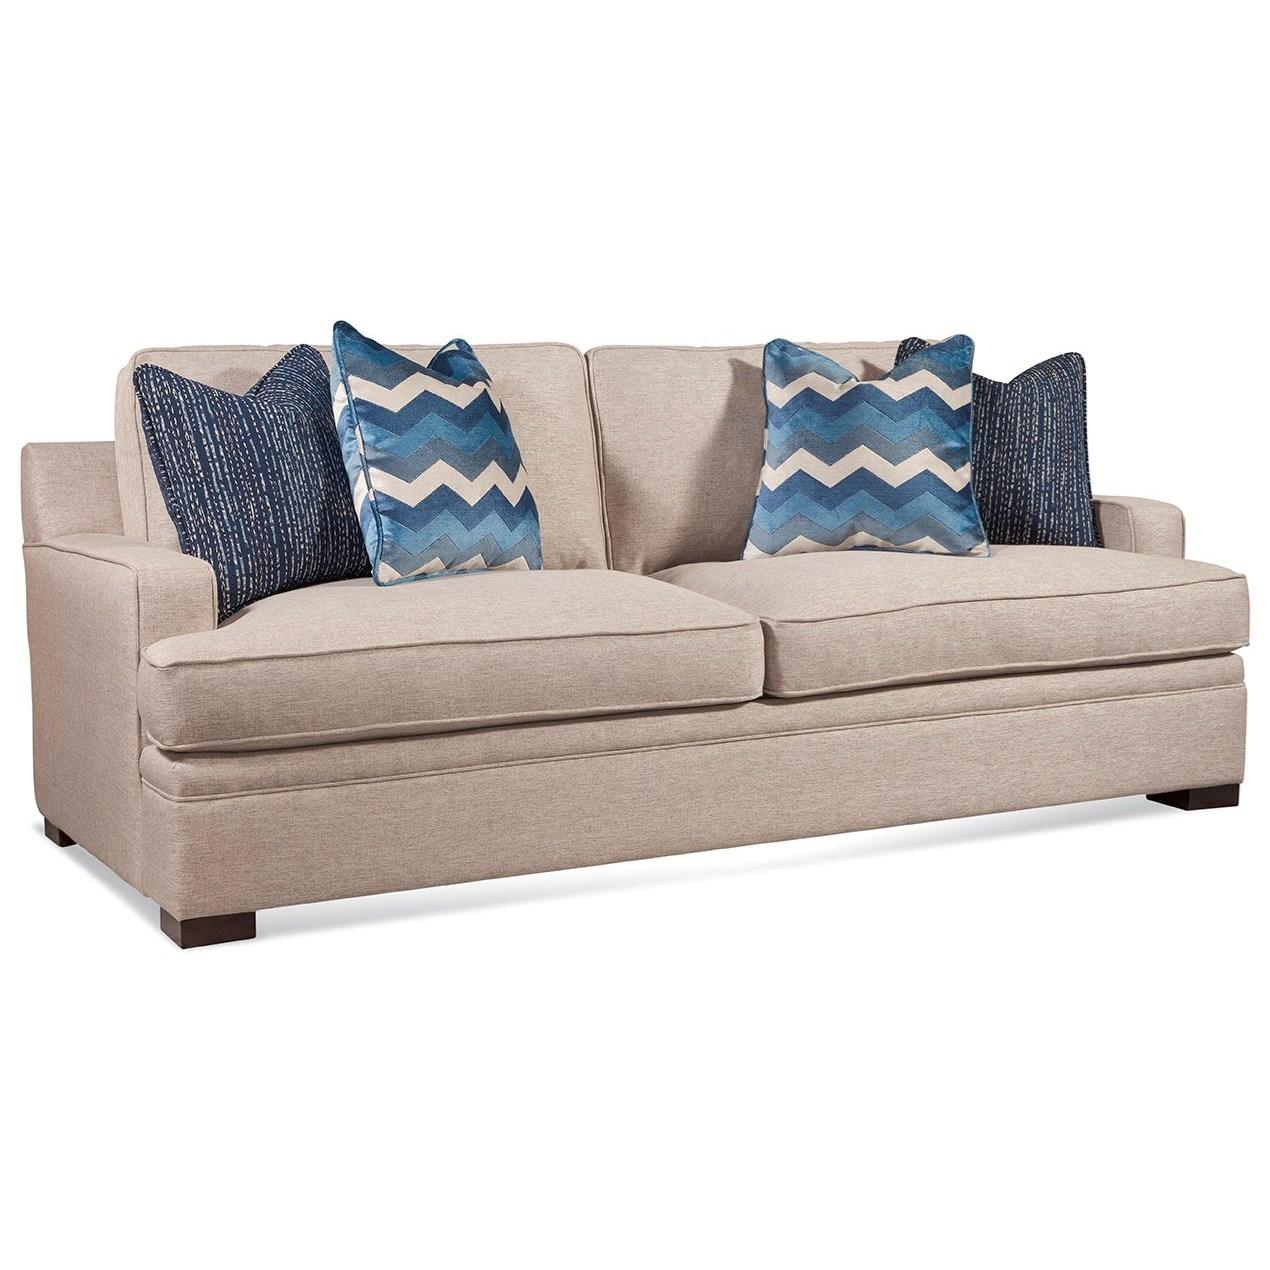 Braxton Culler WestchesterSleeper Sofa With 7